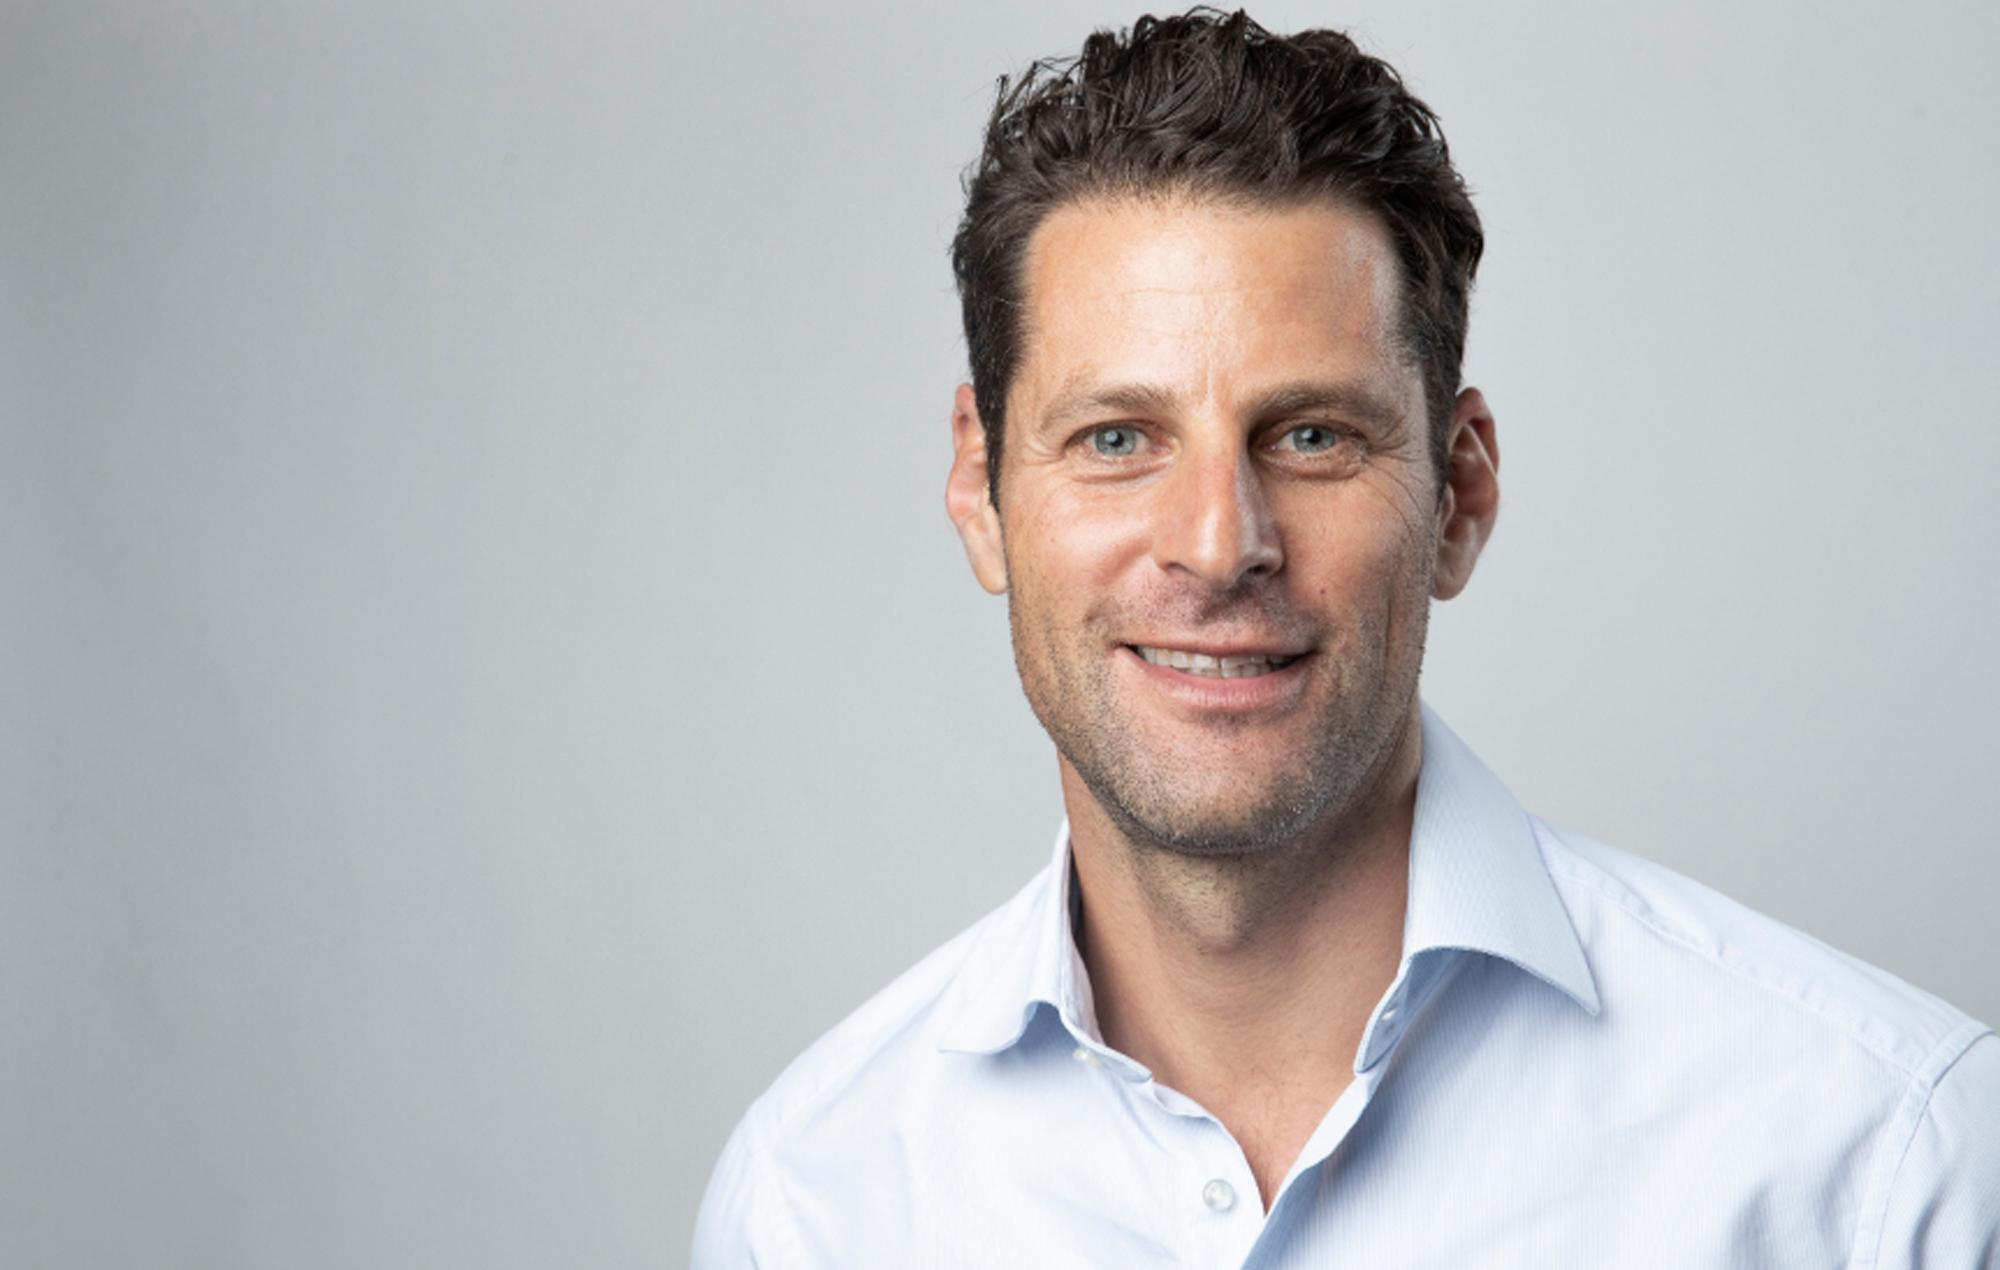 ARIA CEO Dan Rosen